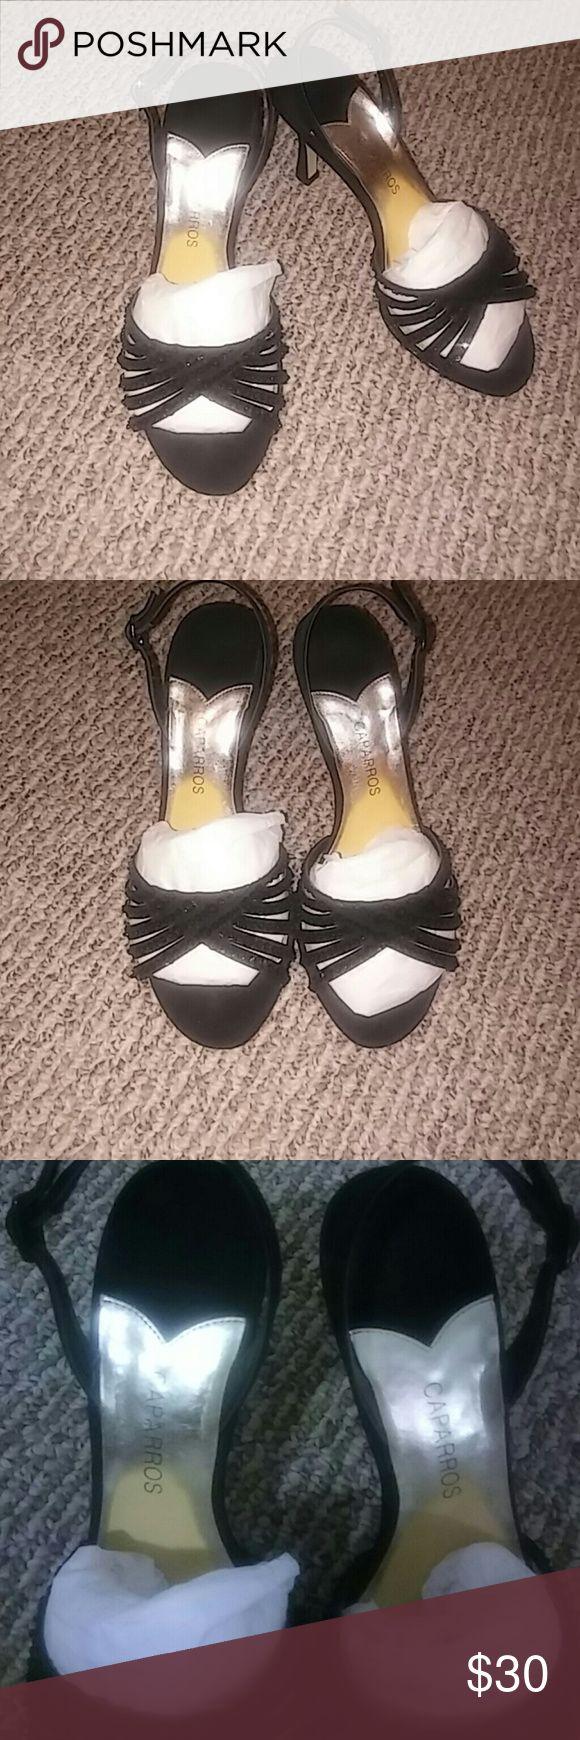 🌼Sexy Black heels by Caparros🌼 Sexy black heels Gently worn like new Caparros Shoes Heels